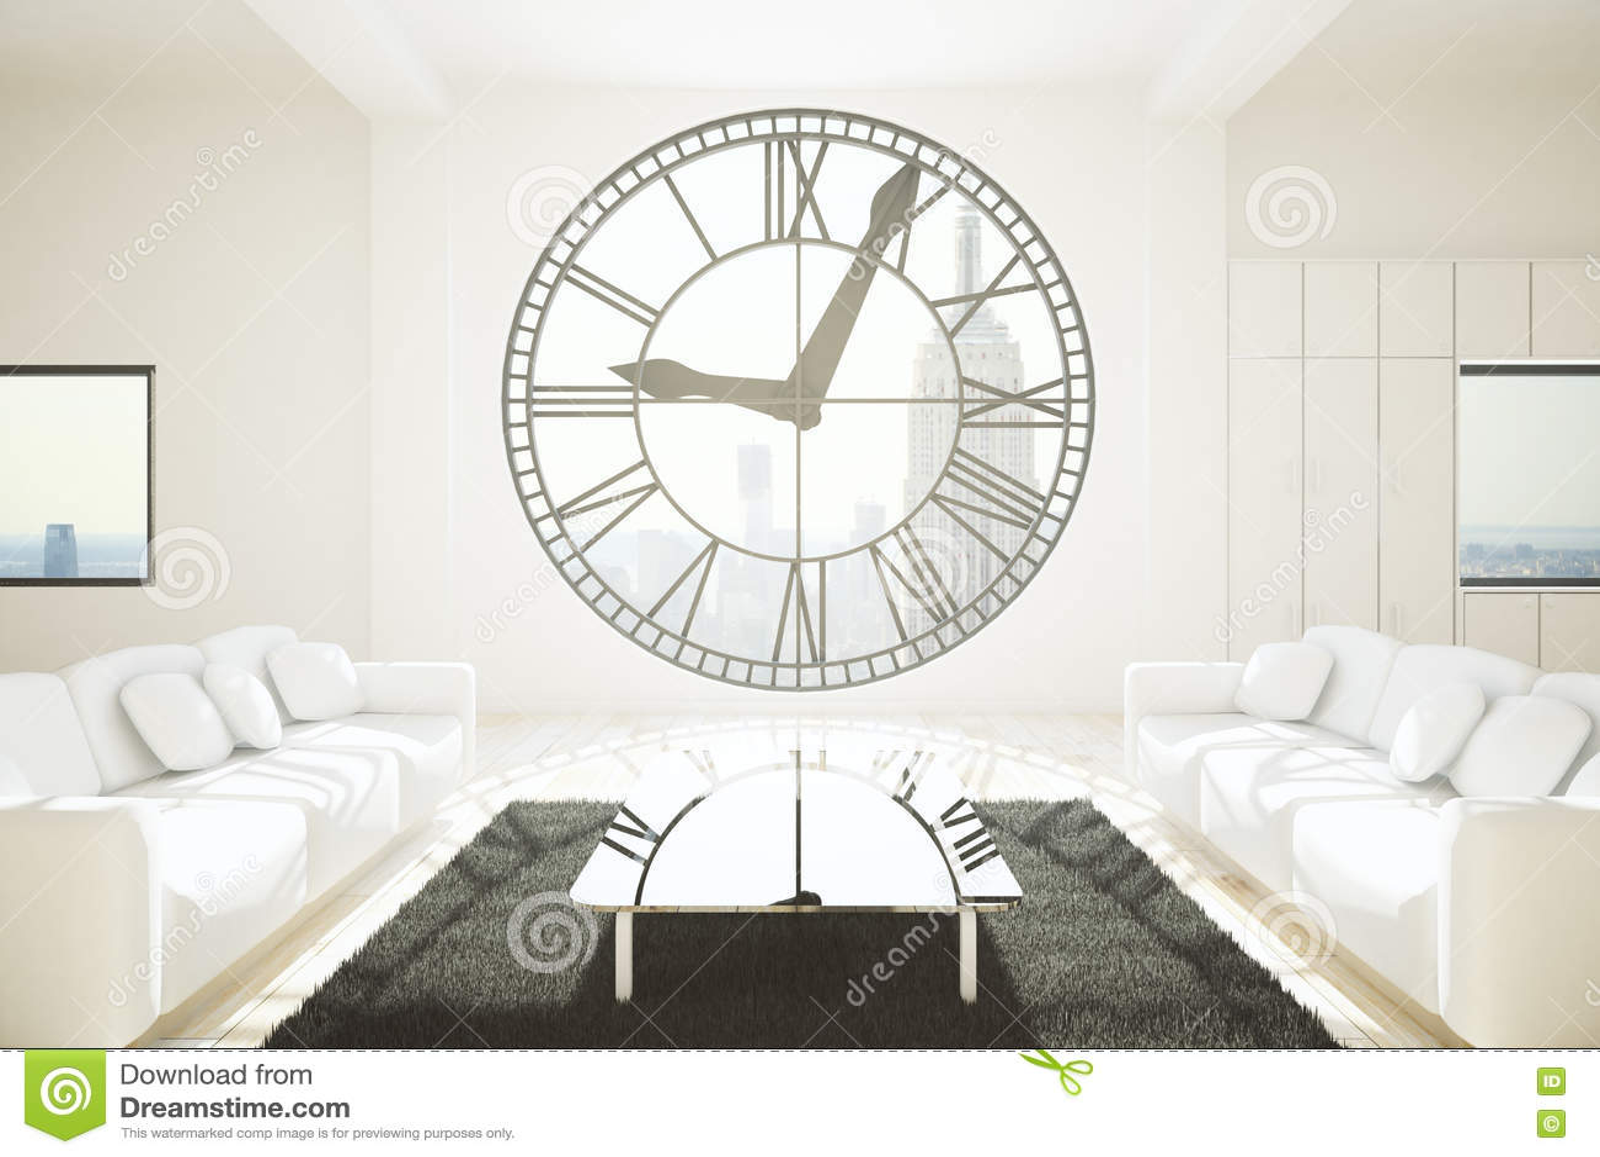 White Room With Clock Window Stock Illustration - Illustration of ...